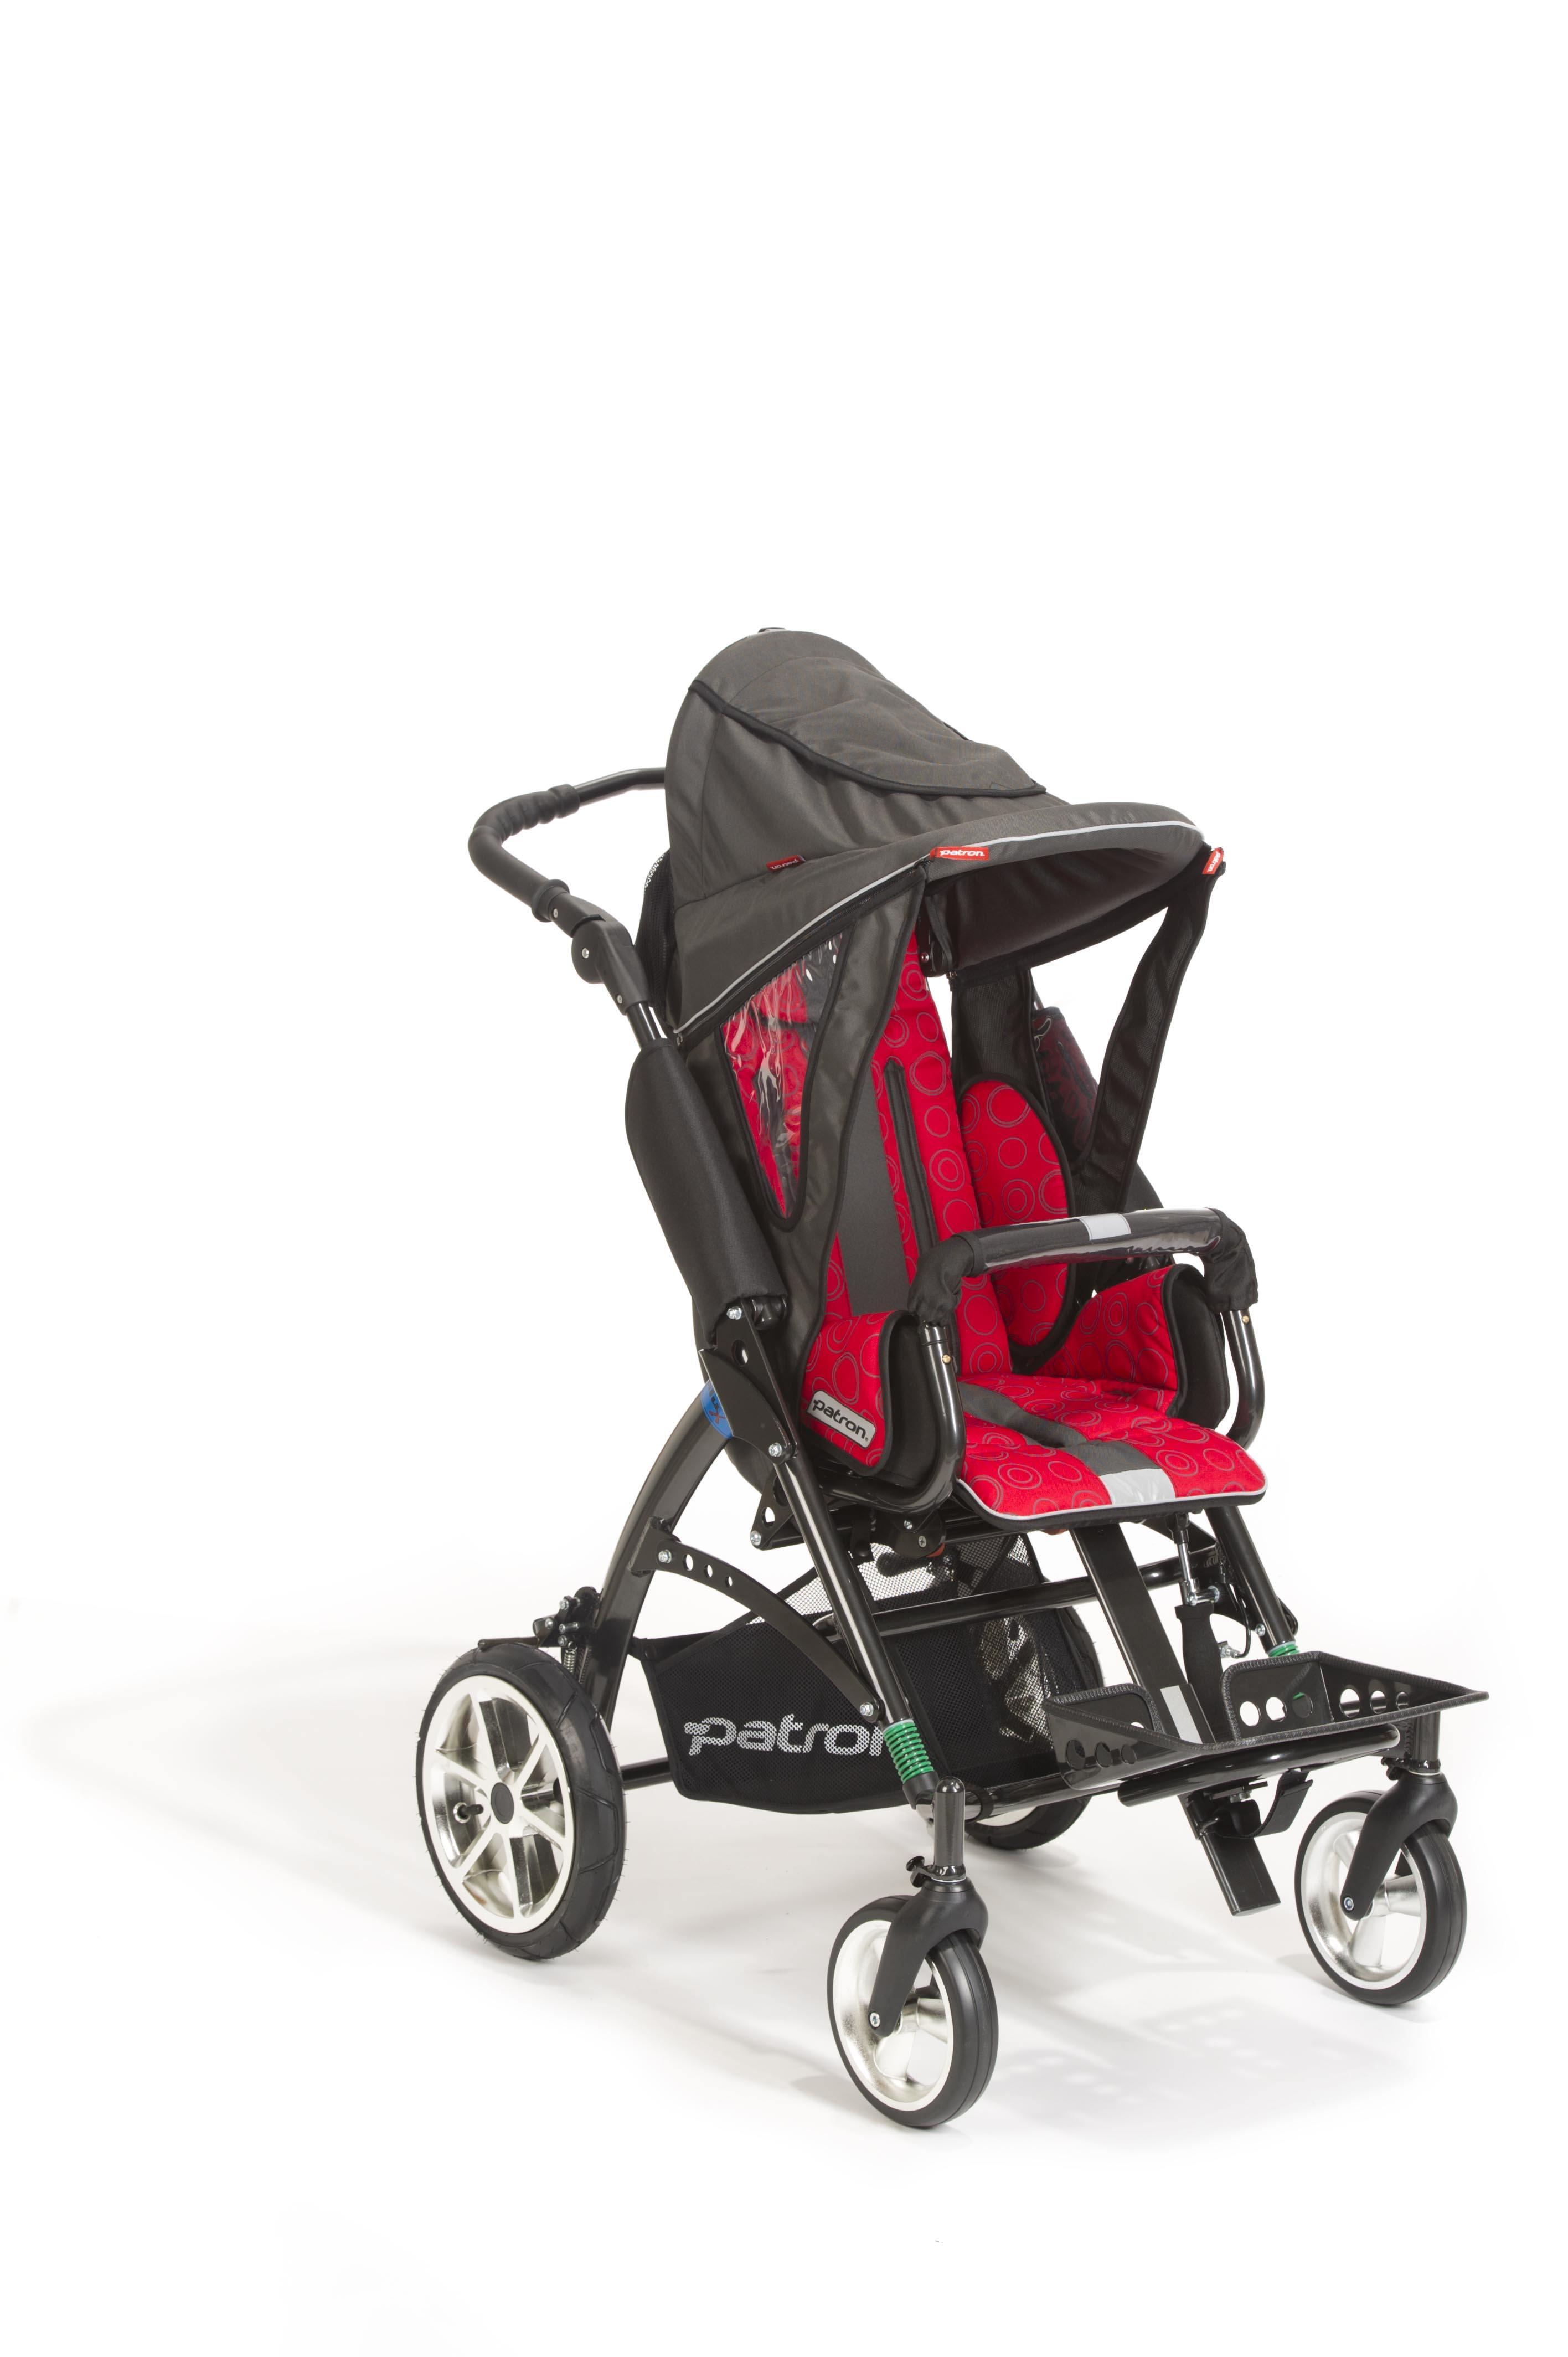 kinder-rehatechnik-ergonomic5